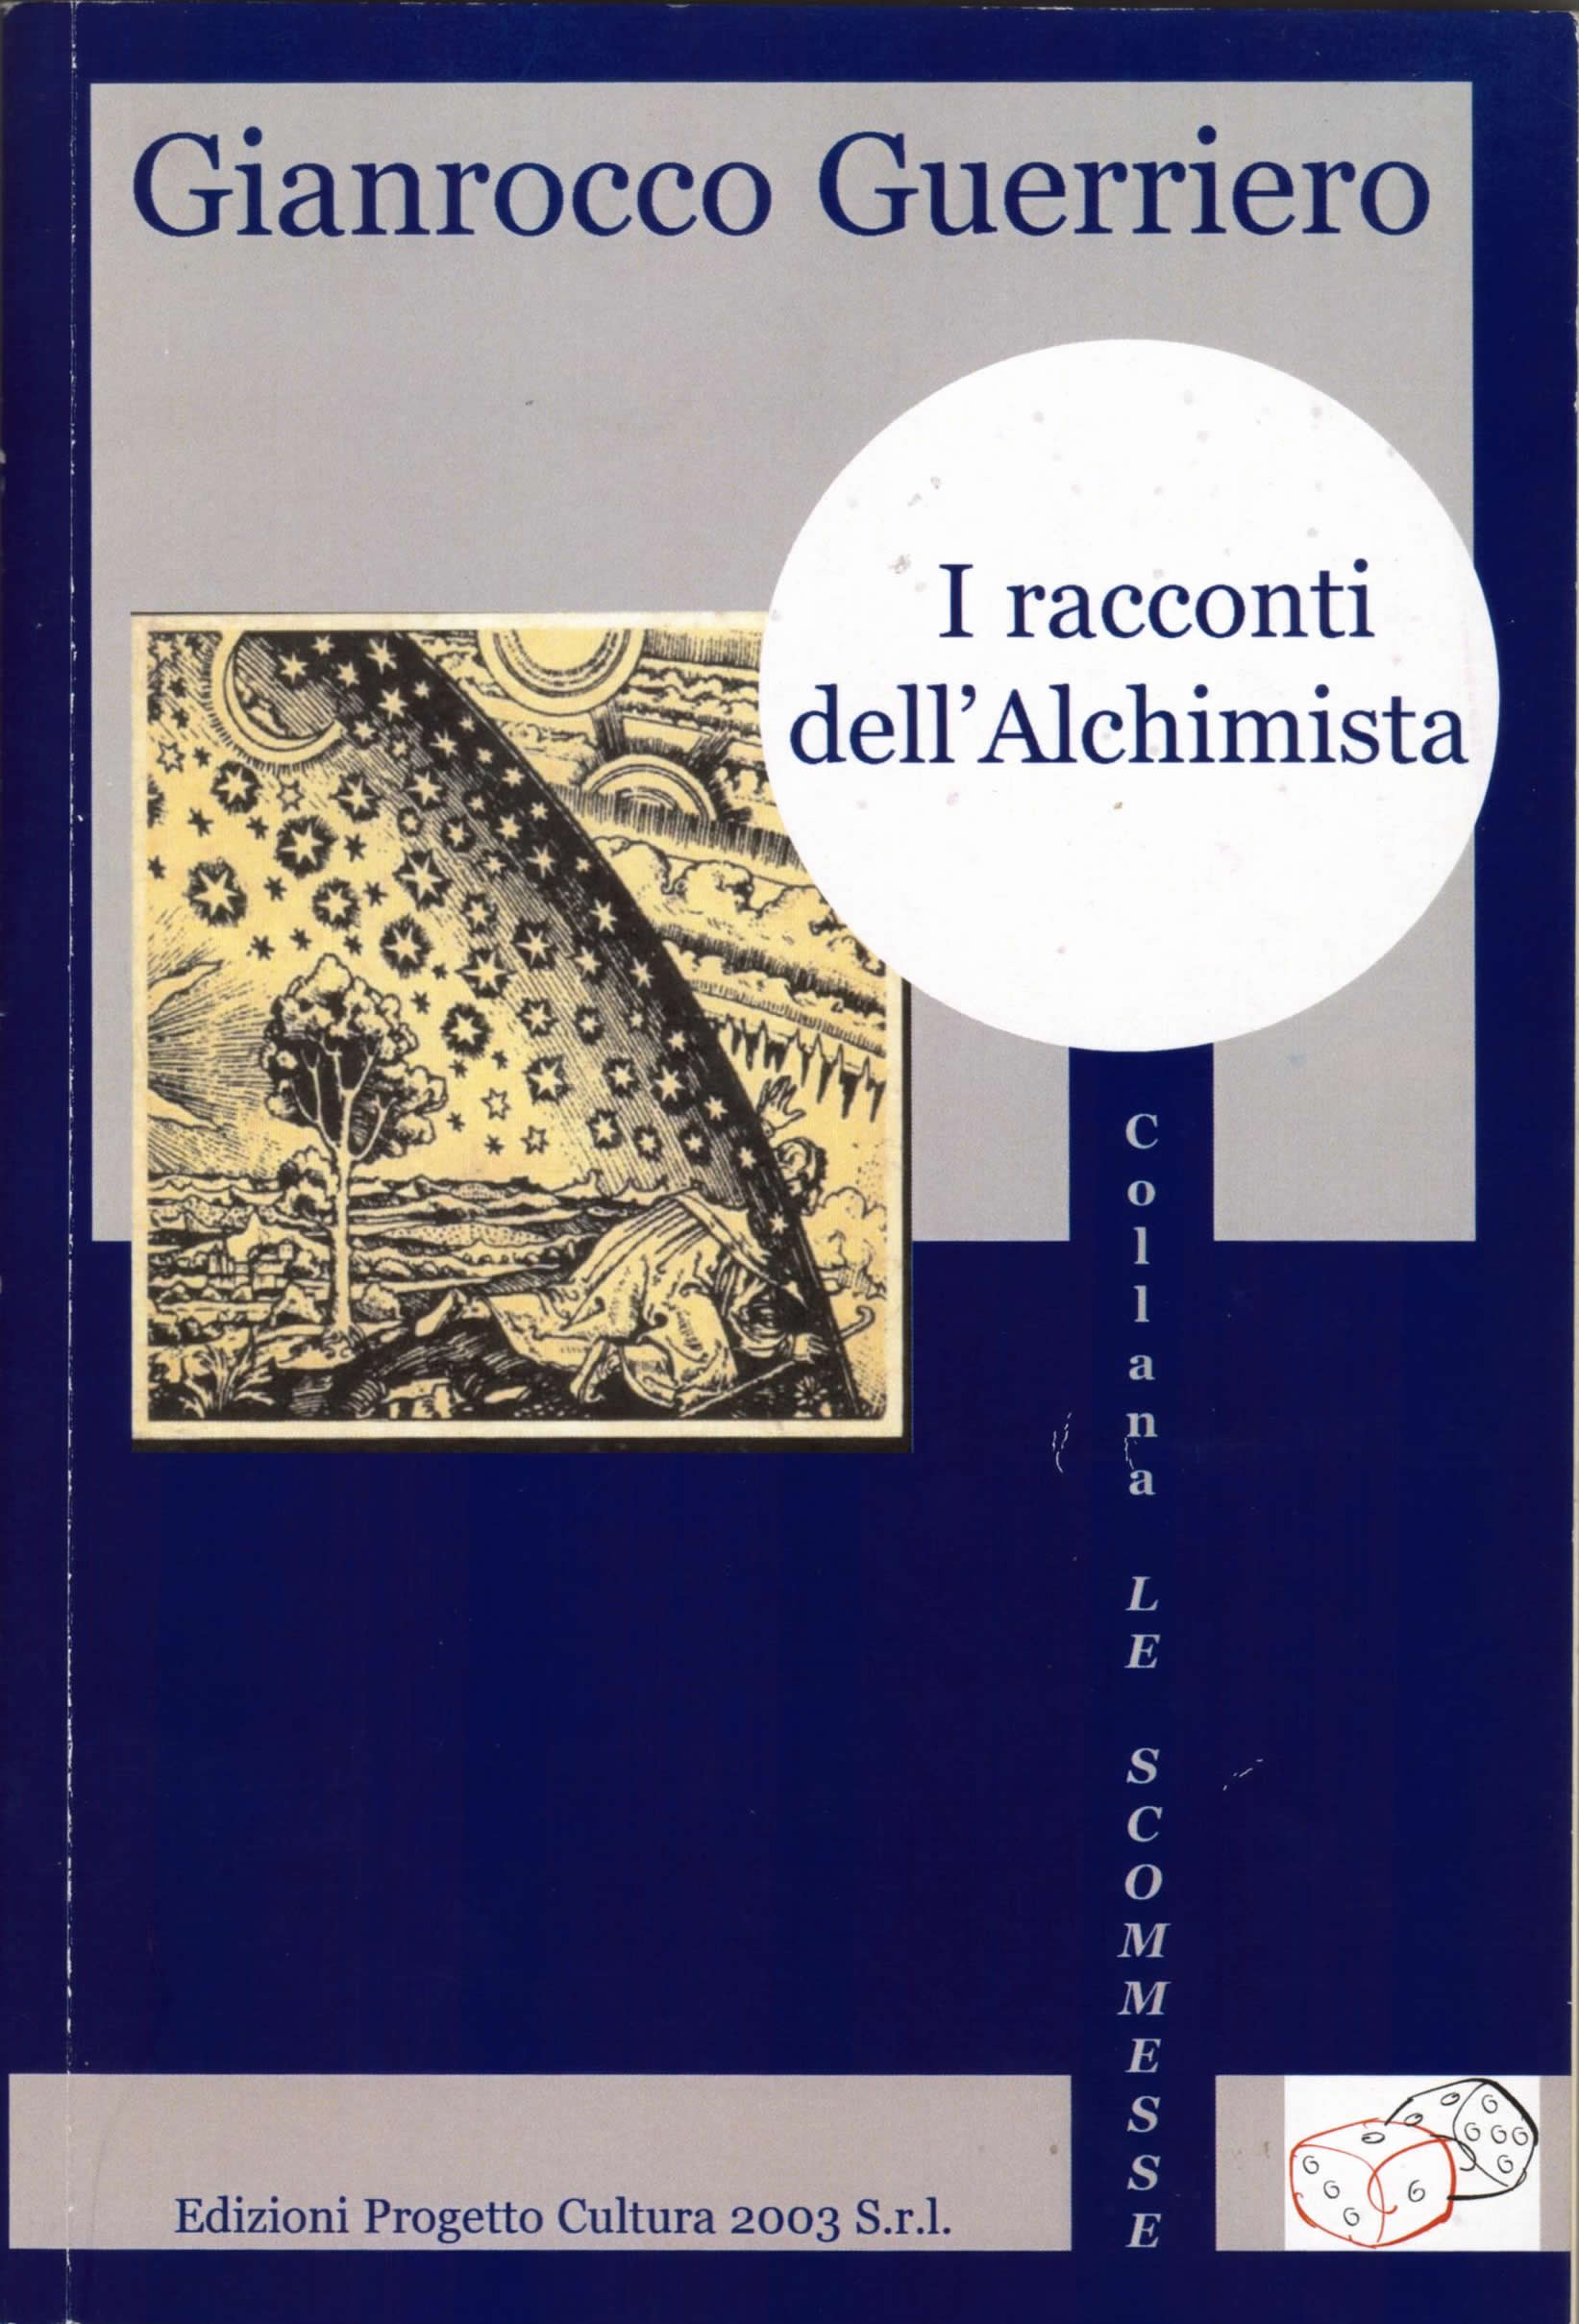 I racconti dell'alchimista